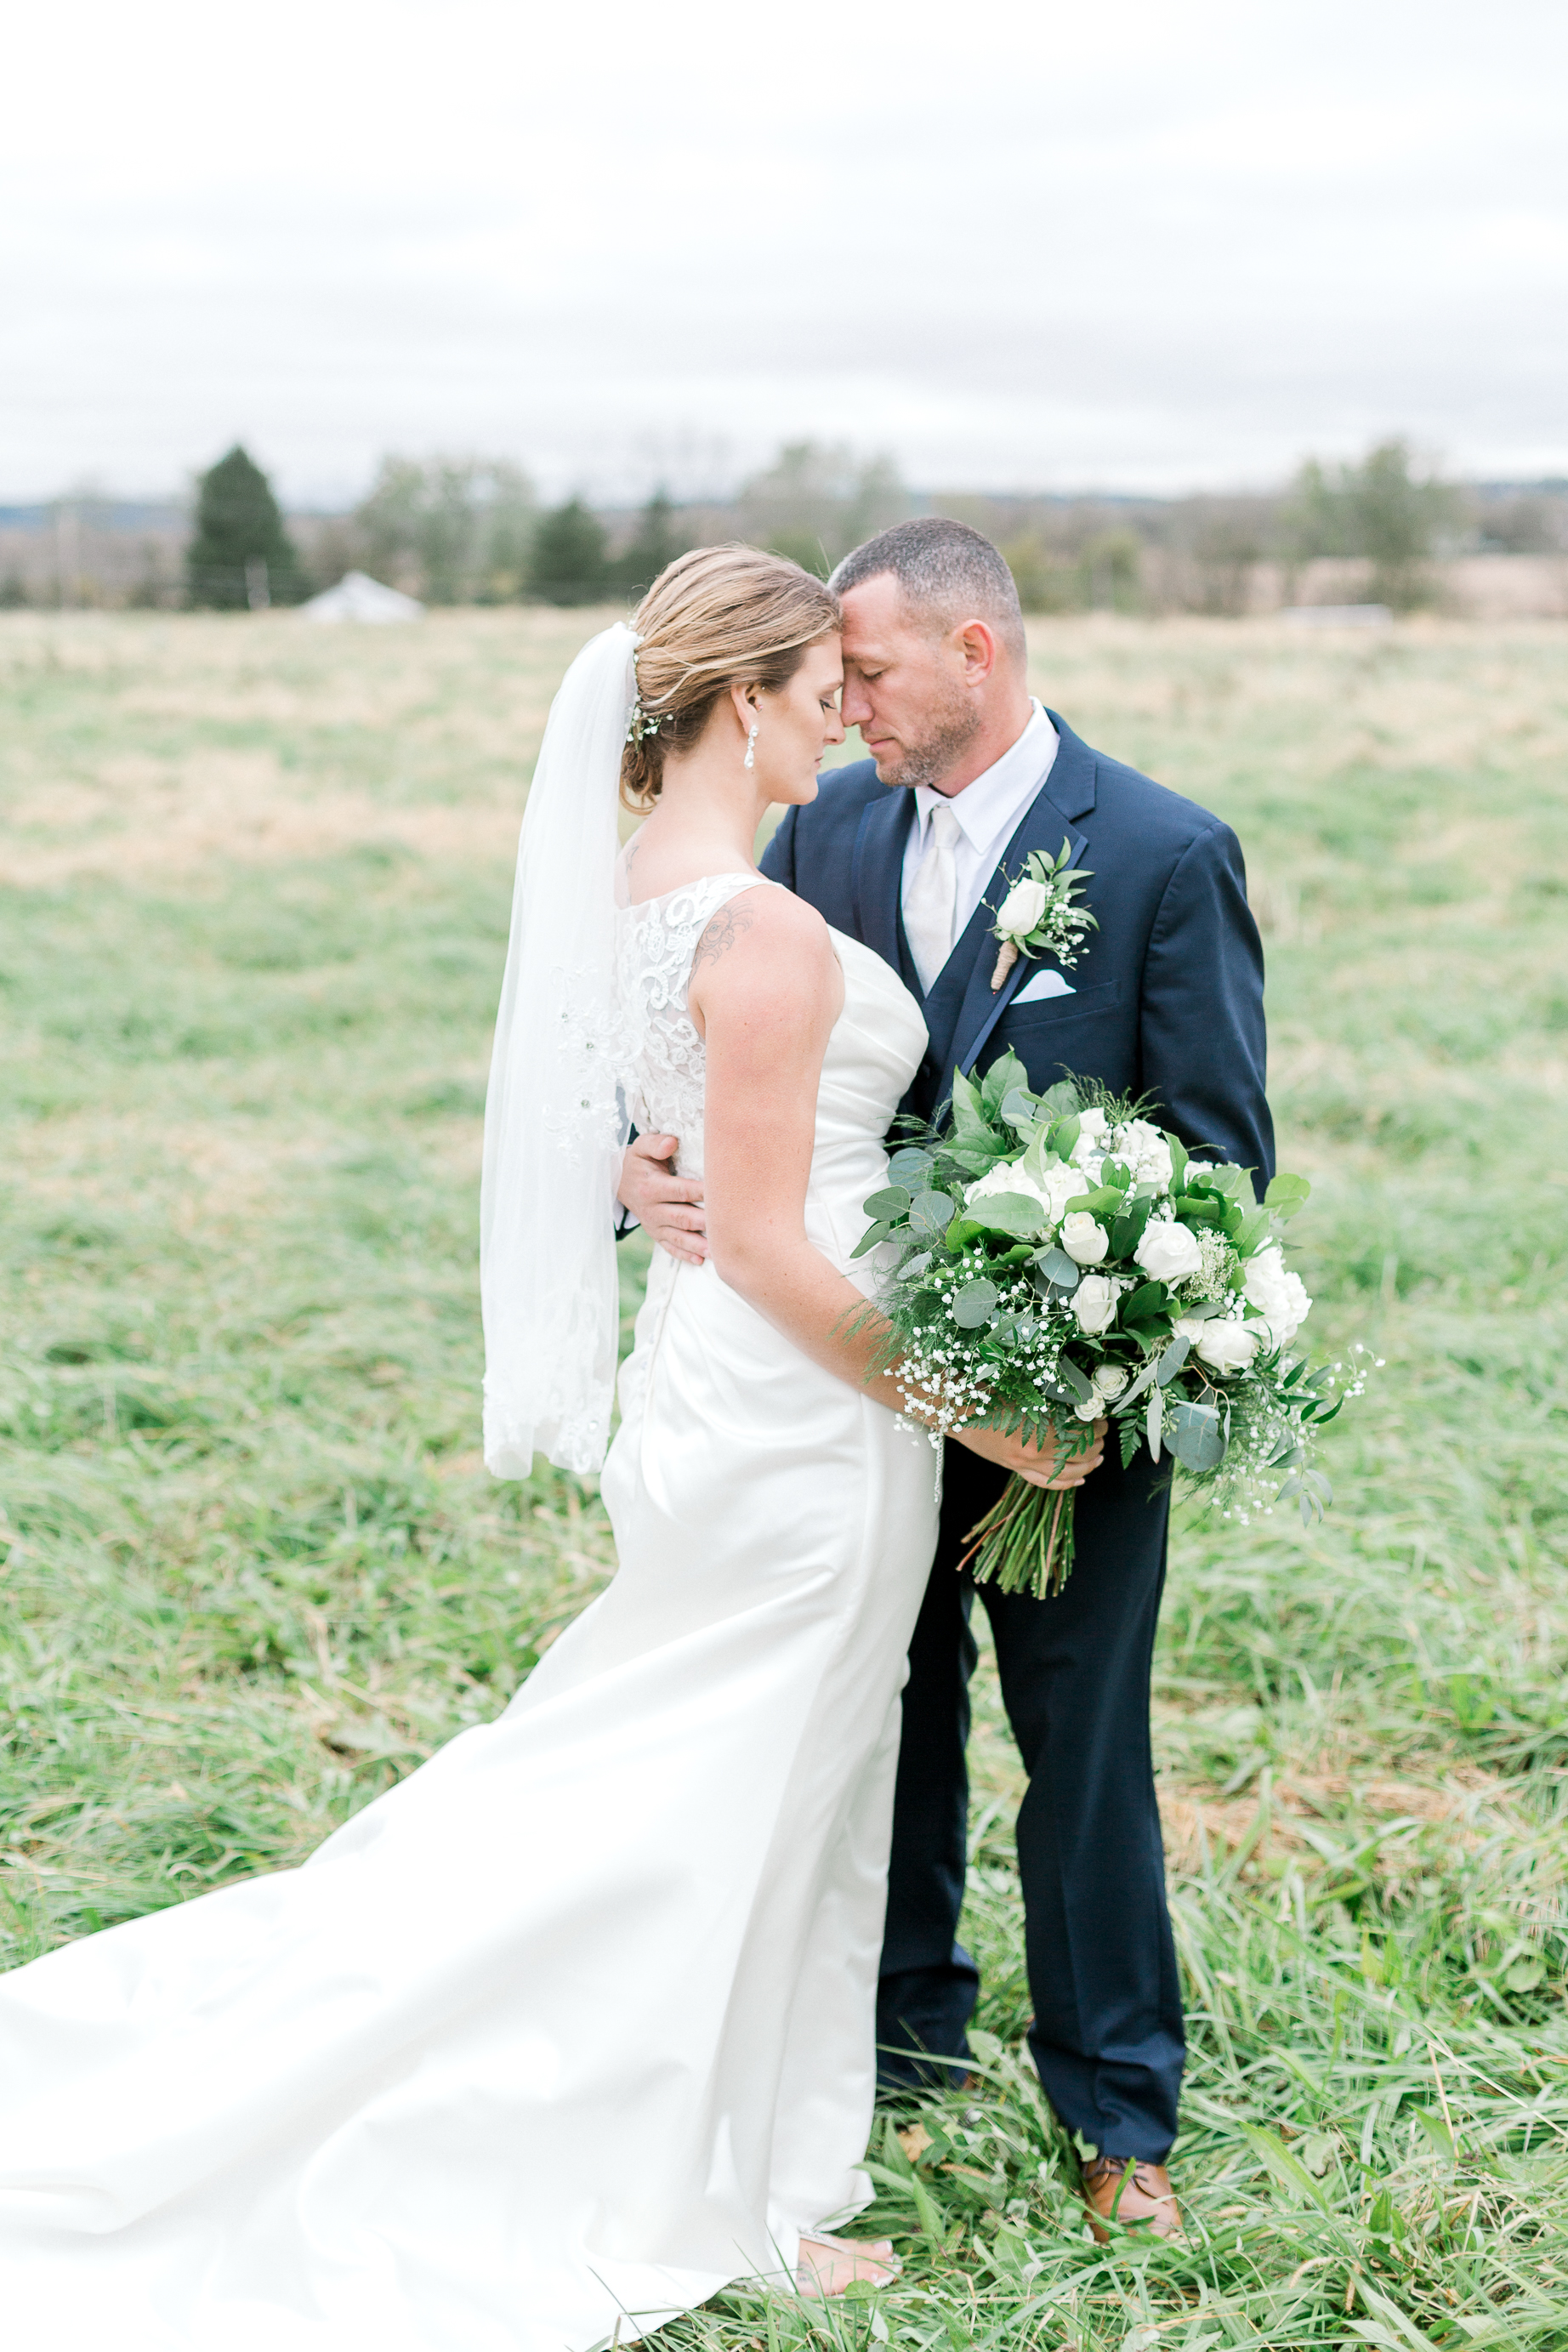 Pennsylvania October Fall Lehigh Valley wedding and lifestyle photographer Lytle Photo Co (115 of 167).jpg